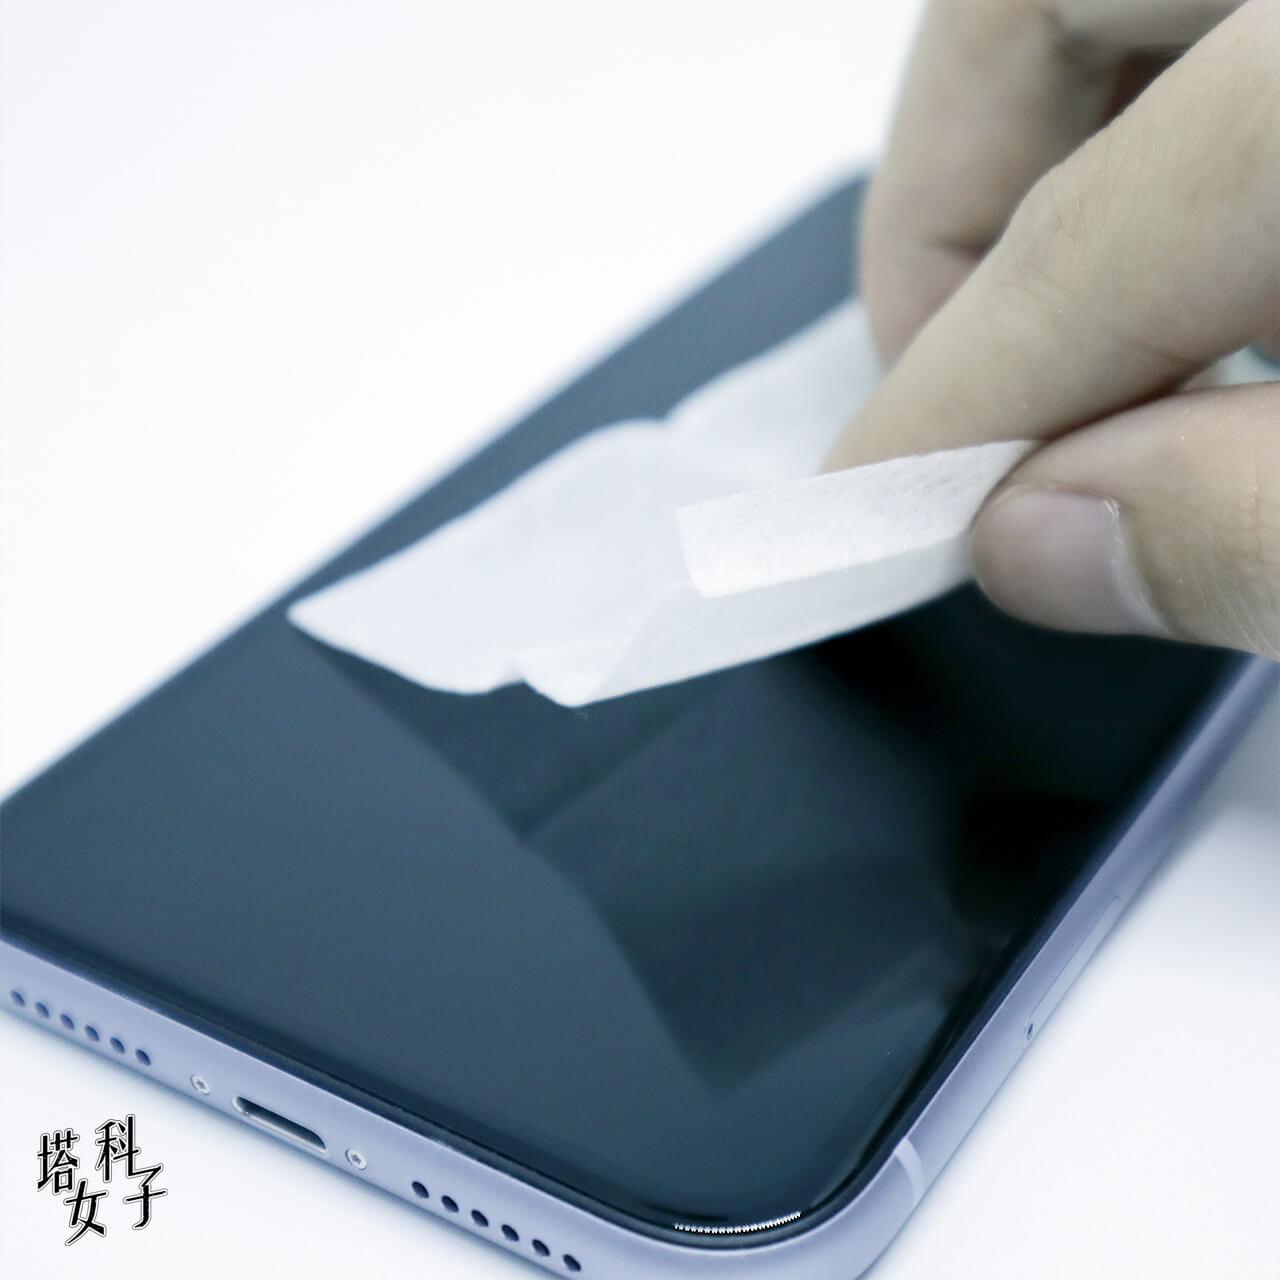 Just mobile Xkin™ 非滿版強化玻璃貼 擦拭